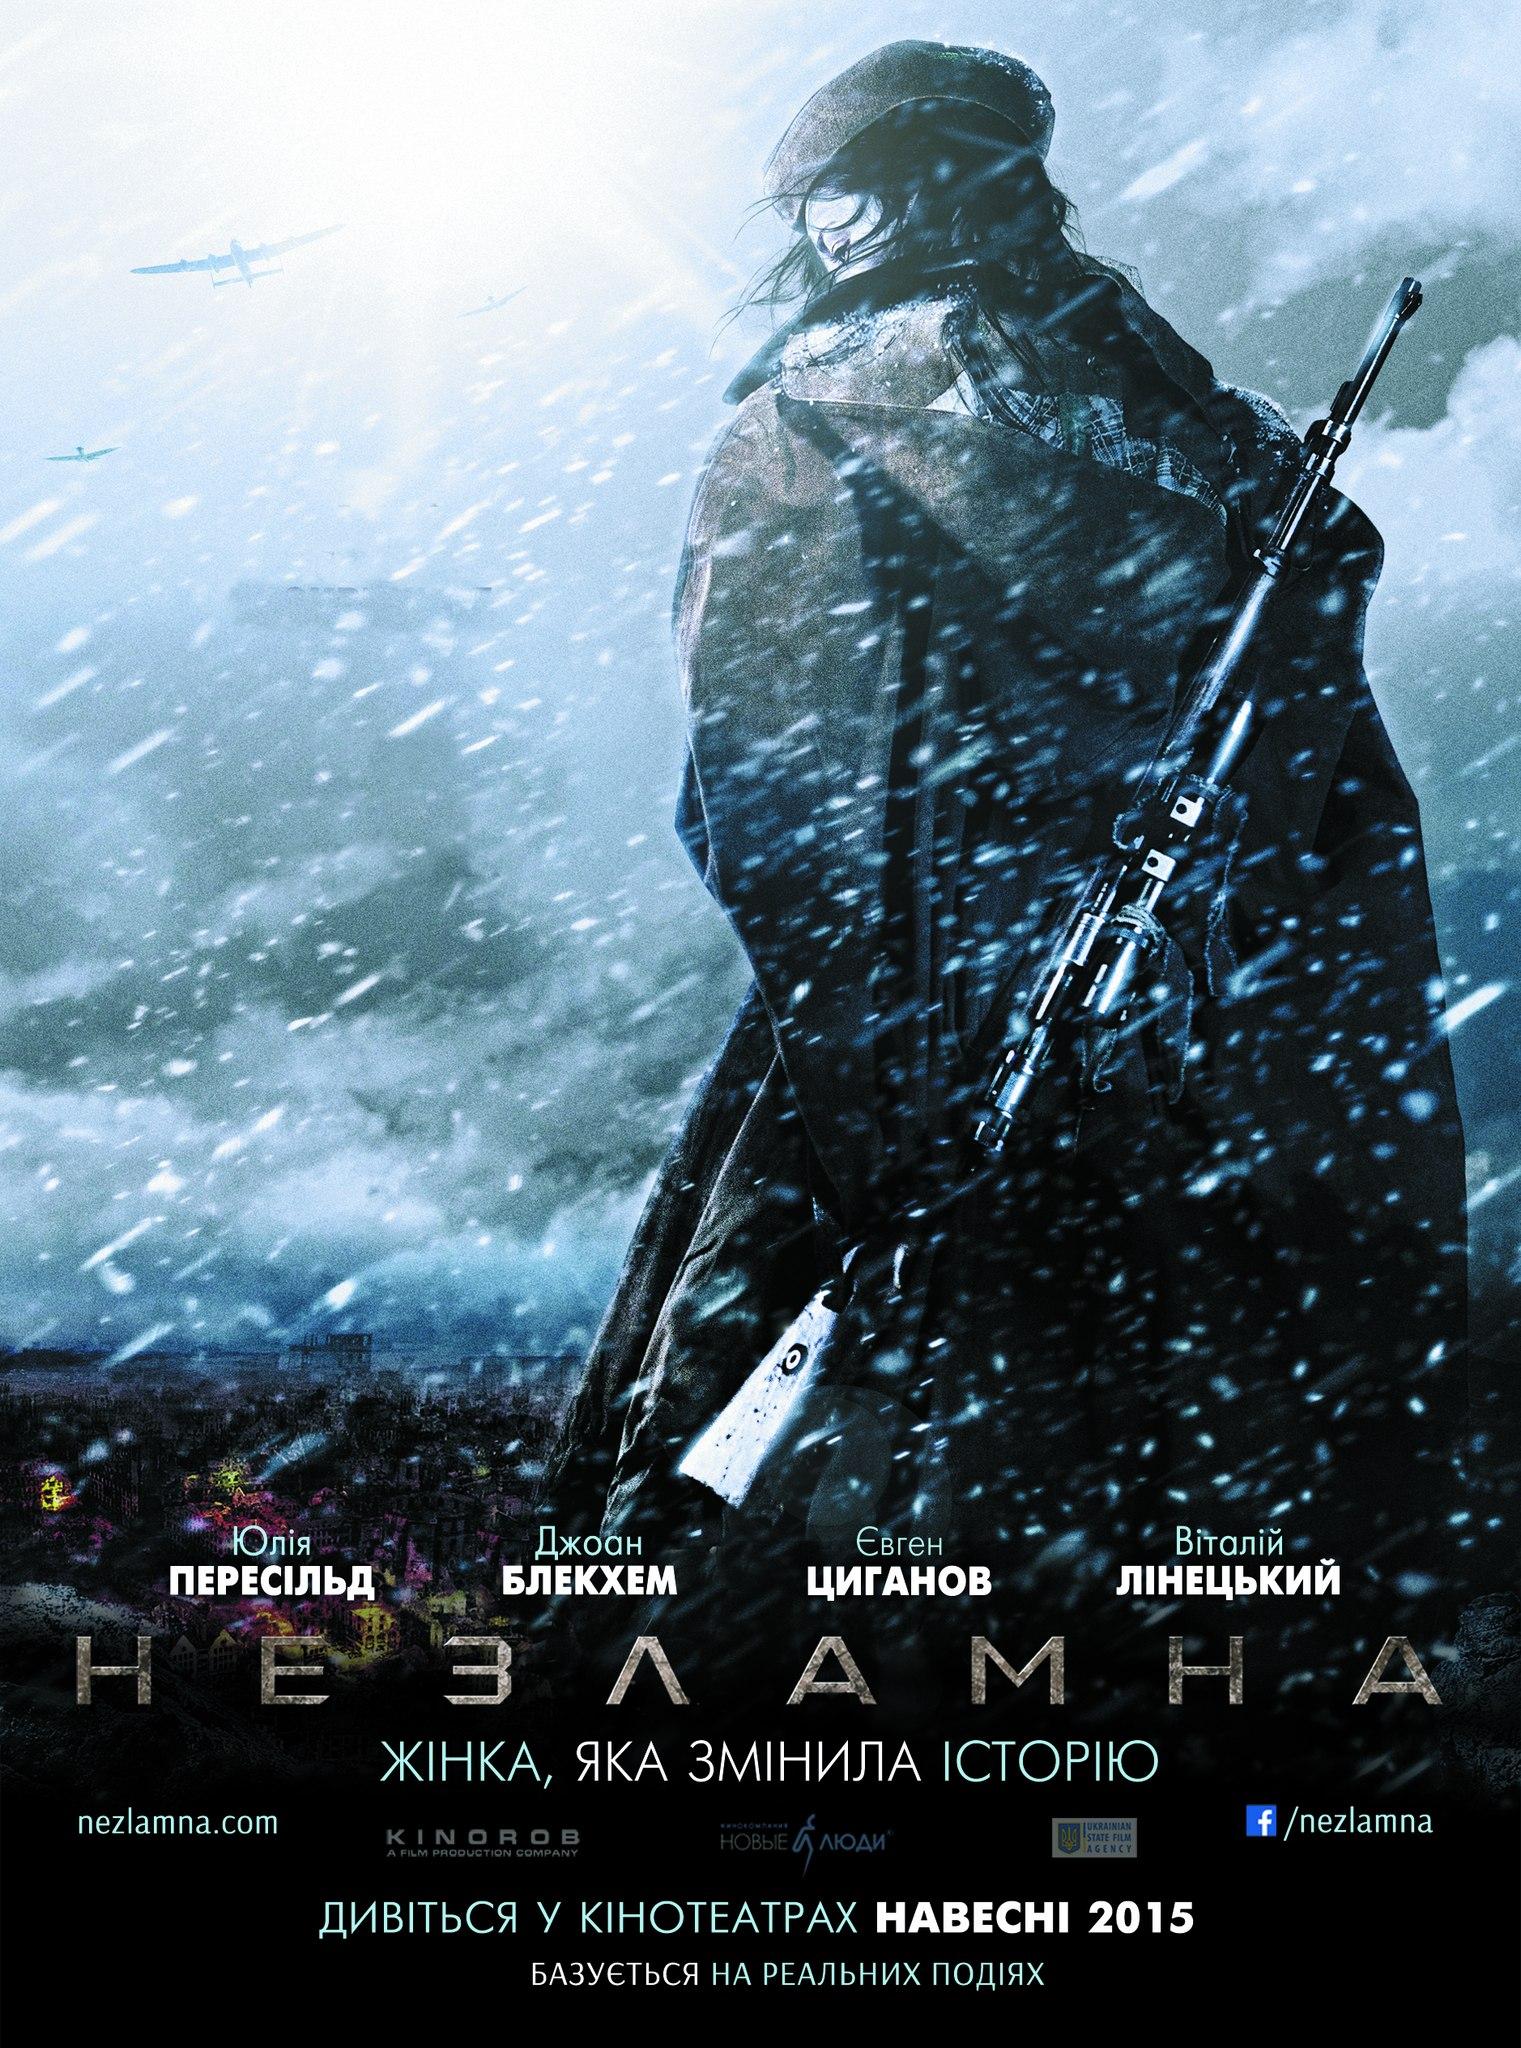 LVII Series & Movies DB - Página 6 Bitva-za-sevastopol-poster3b